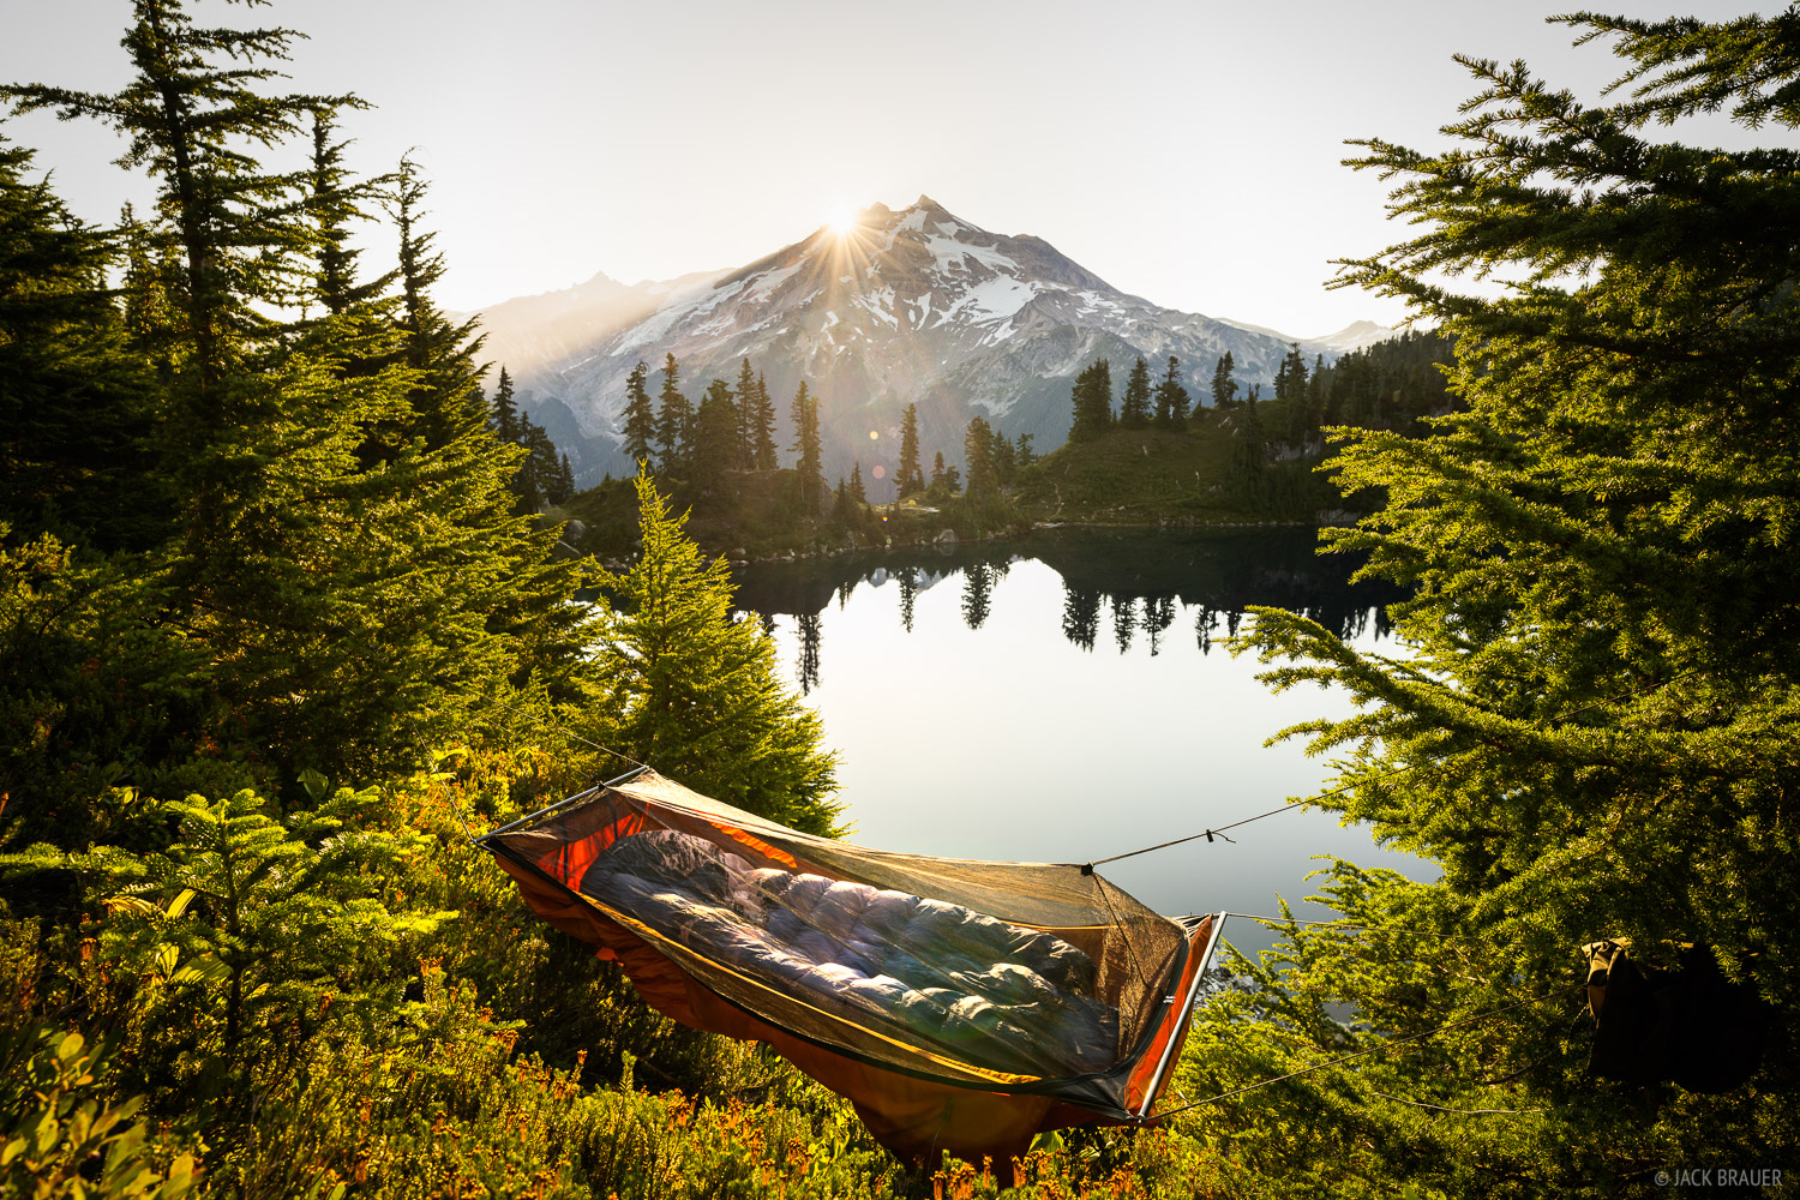 Glacier Peak, Glacier Peak Wilderness, Lake Byrne, Washington, hammock, Cascades, photo